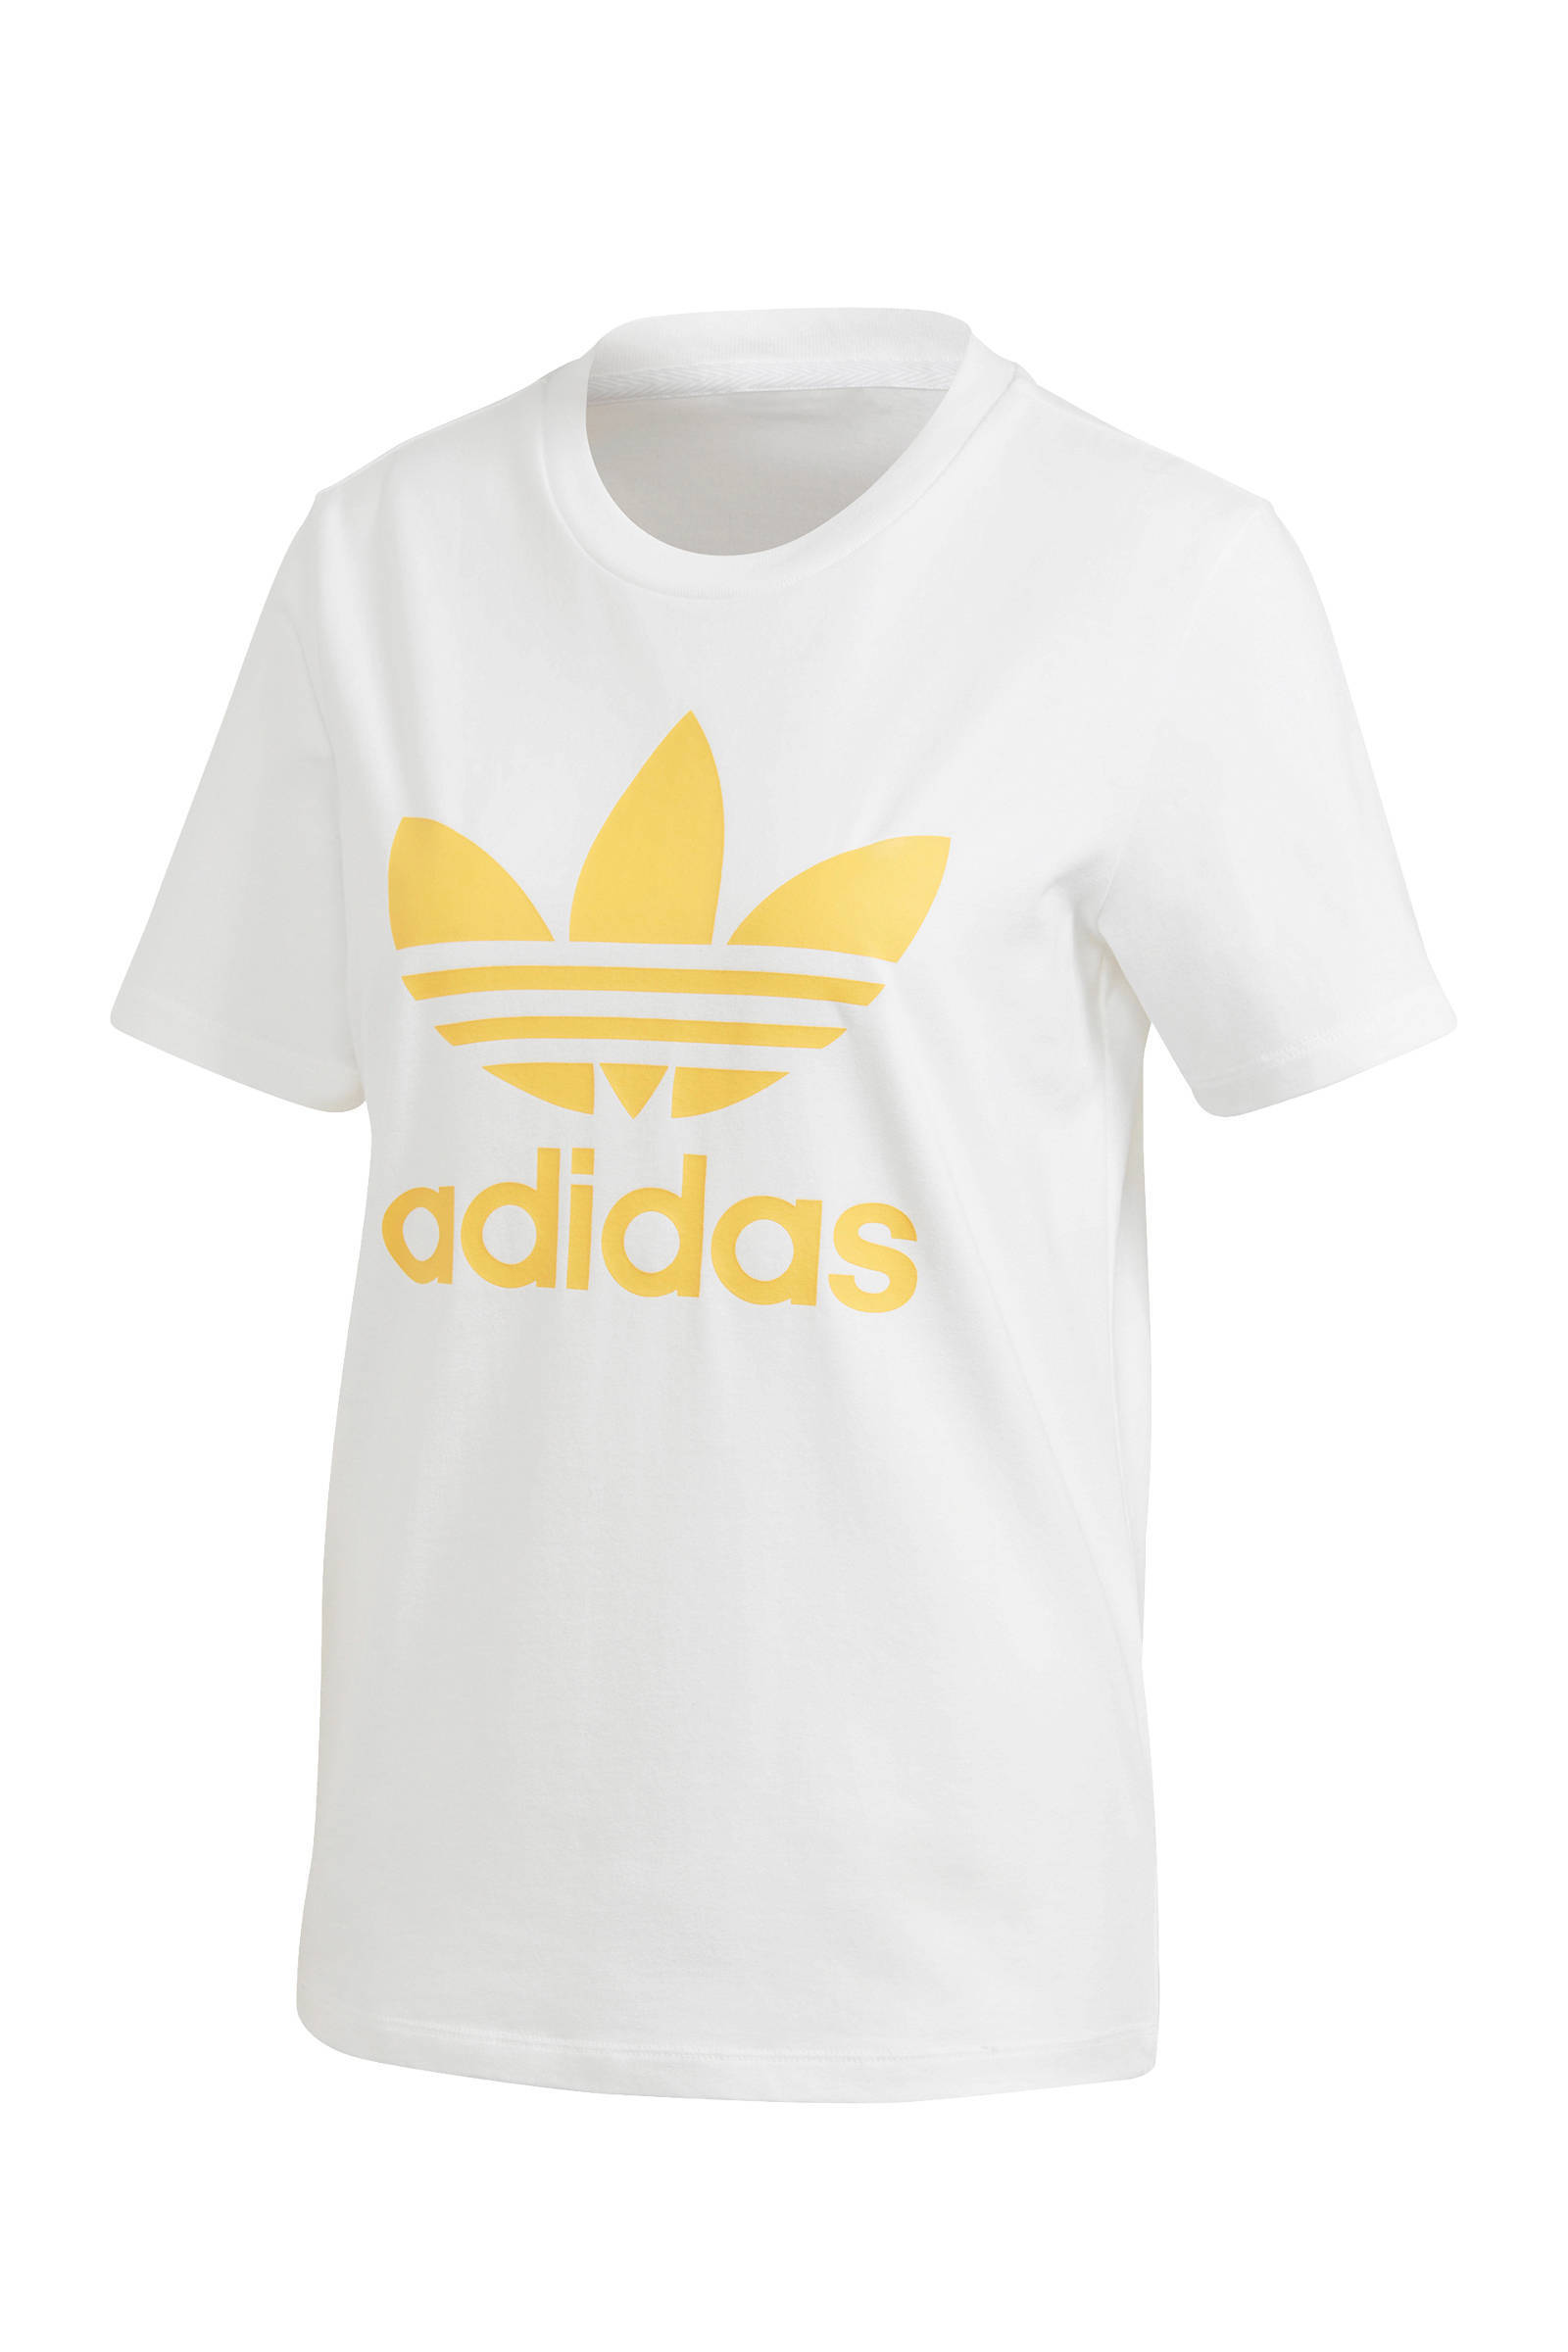 adidas Originals T-shirt wit/geel | wehkamp